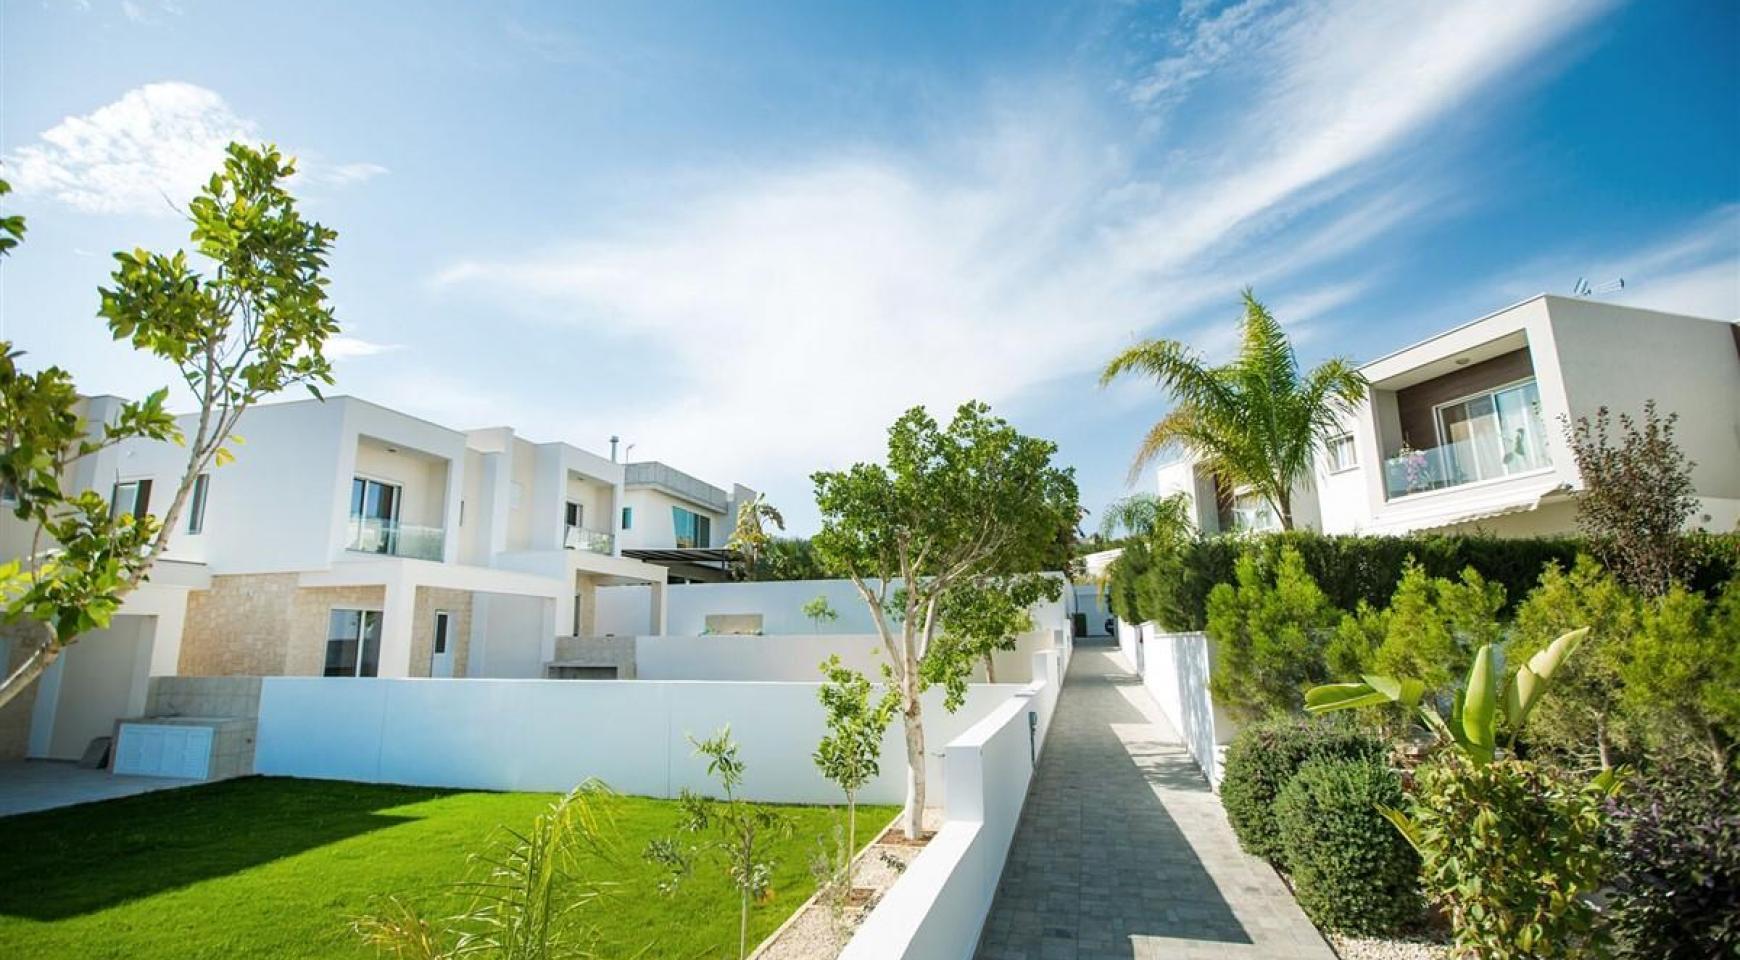 3 Bedroom Villa with Sea Views in Mouttagiaka - 5